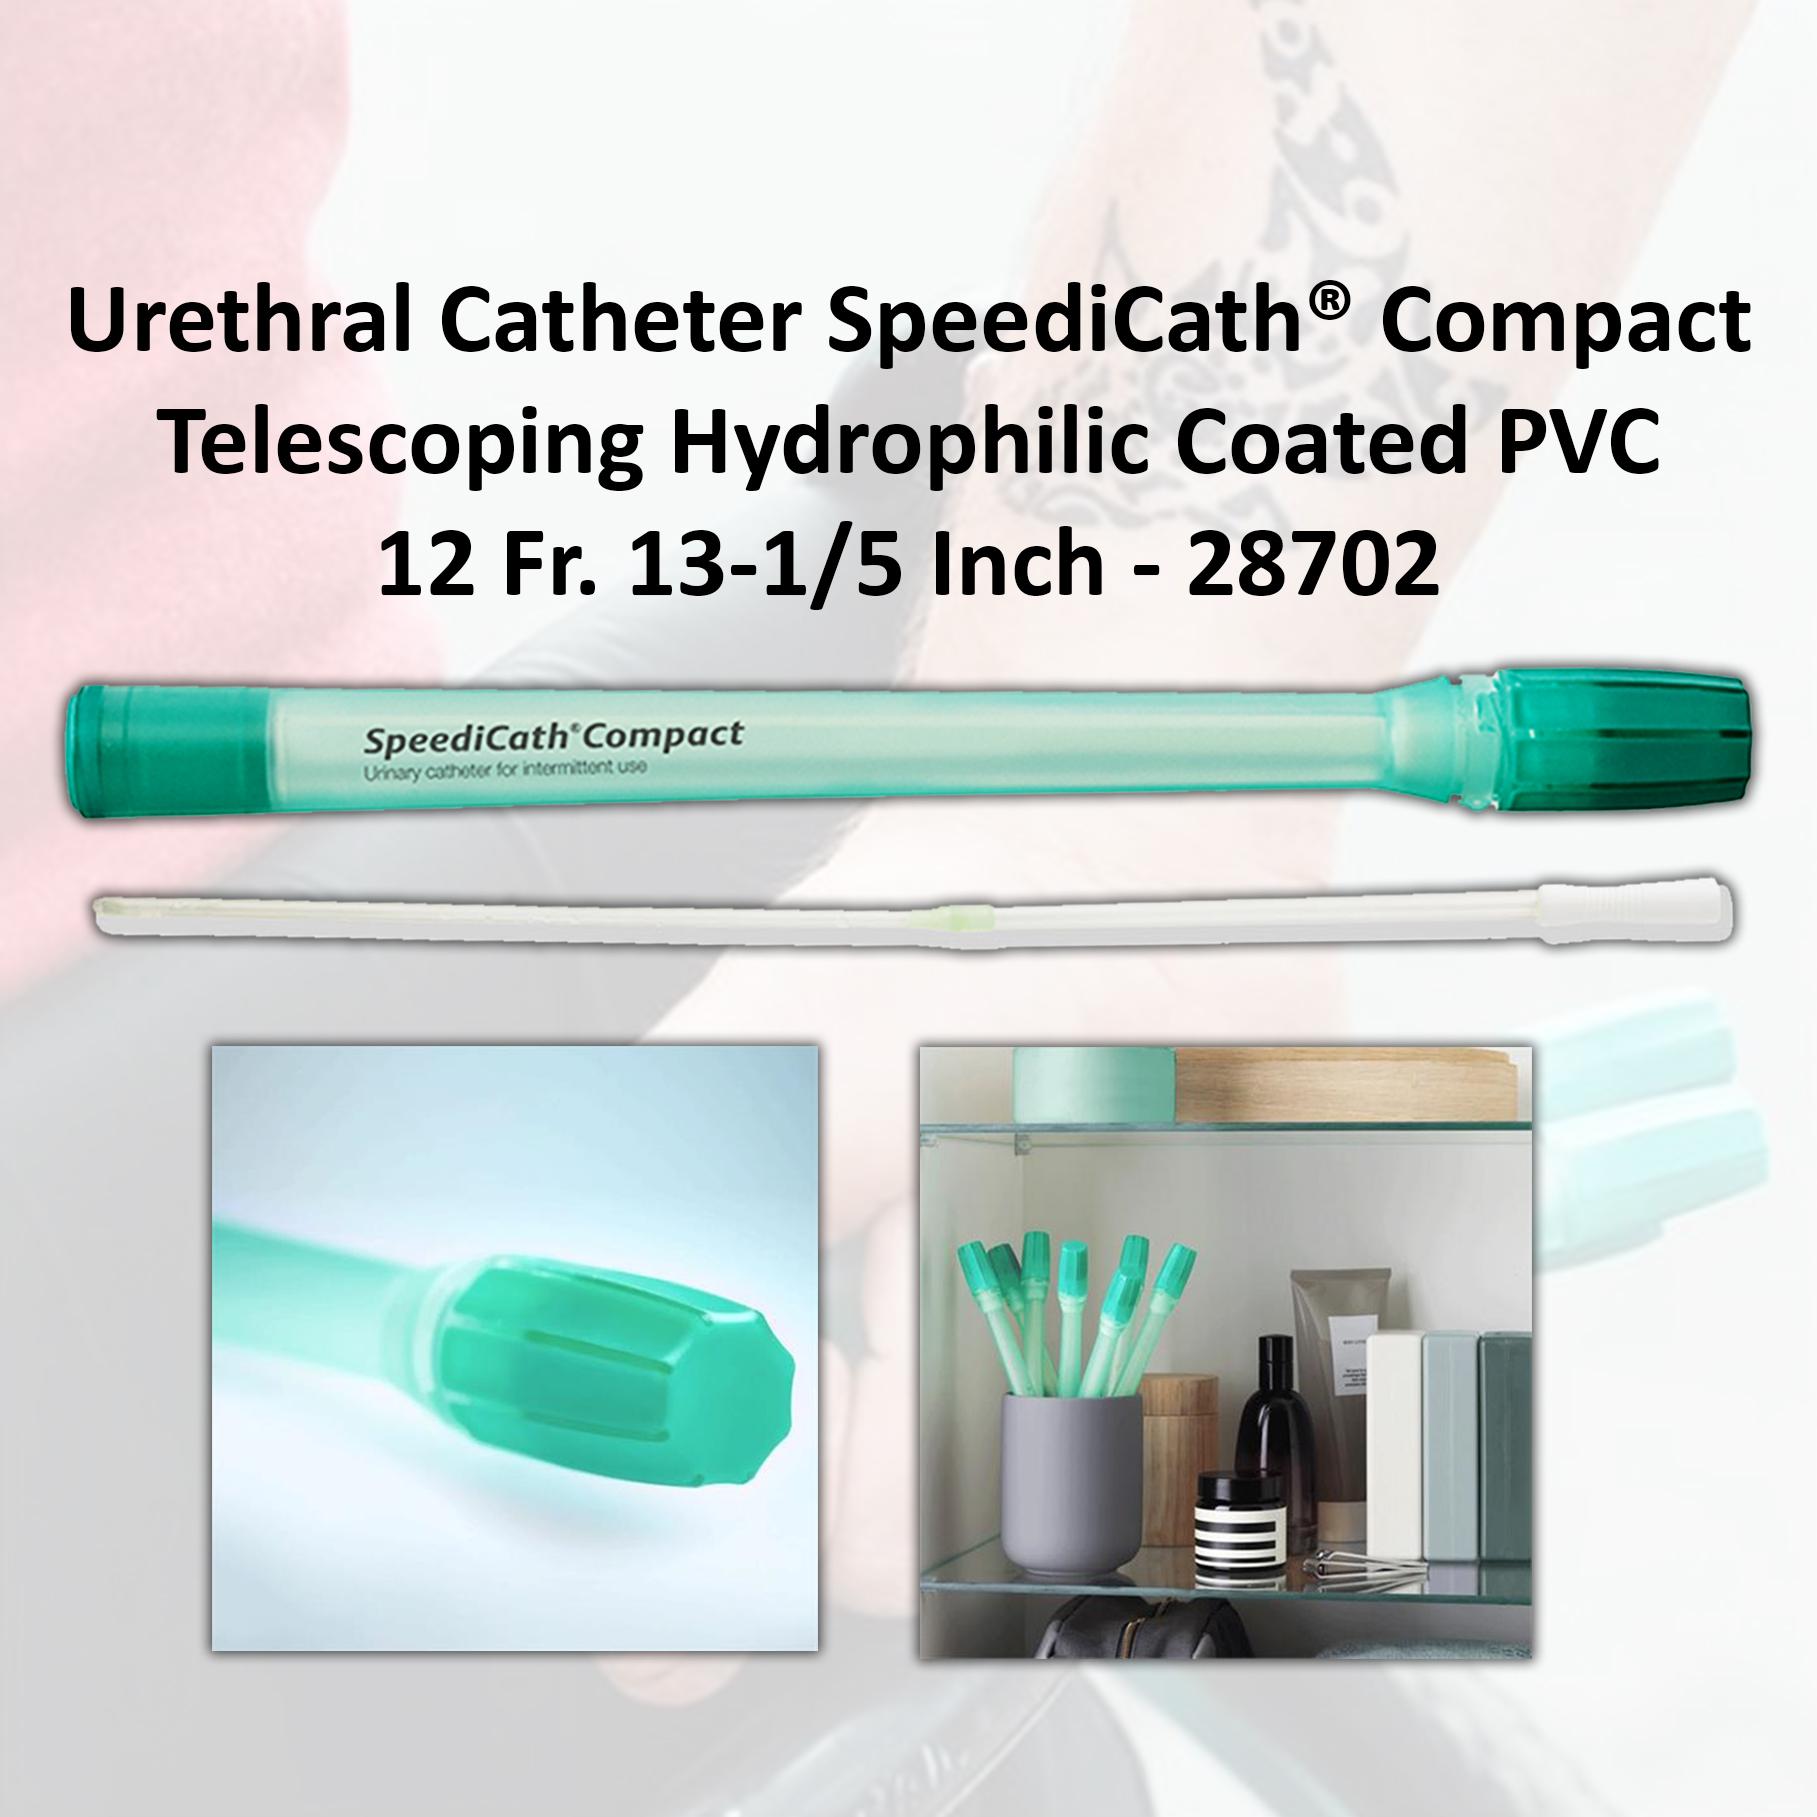 Urethral Catheter SpeediCath® Compact Telescoping Hydrophilic Coated PVC 12 Fr. 13-1/5 Inch - 28702